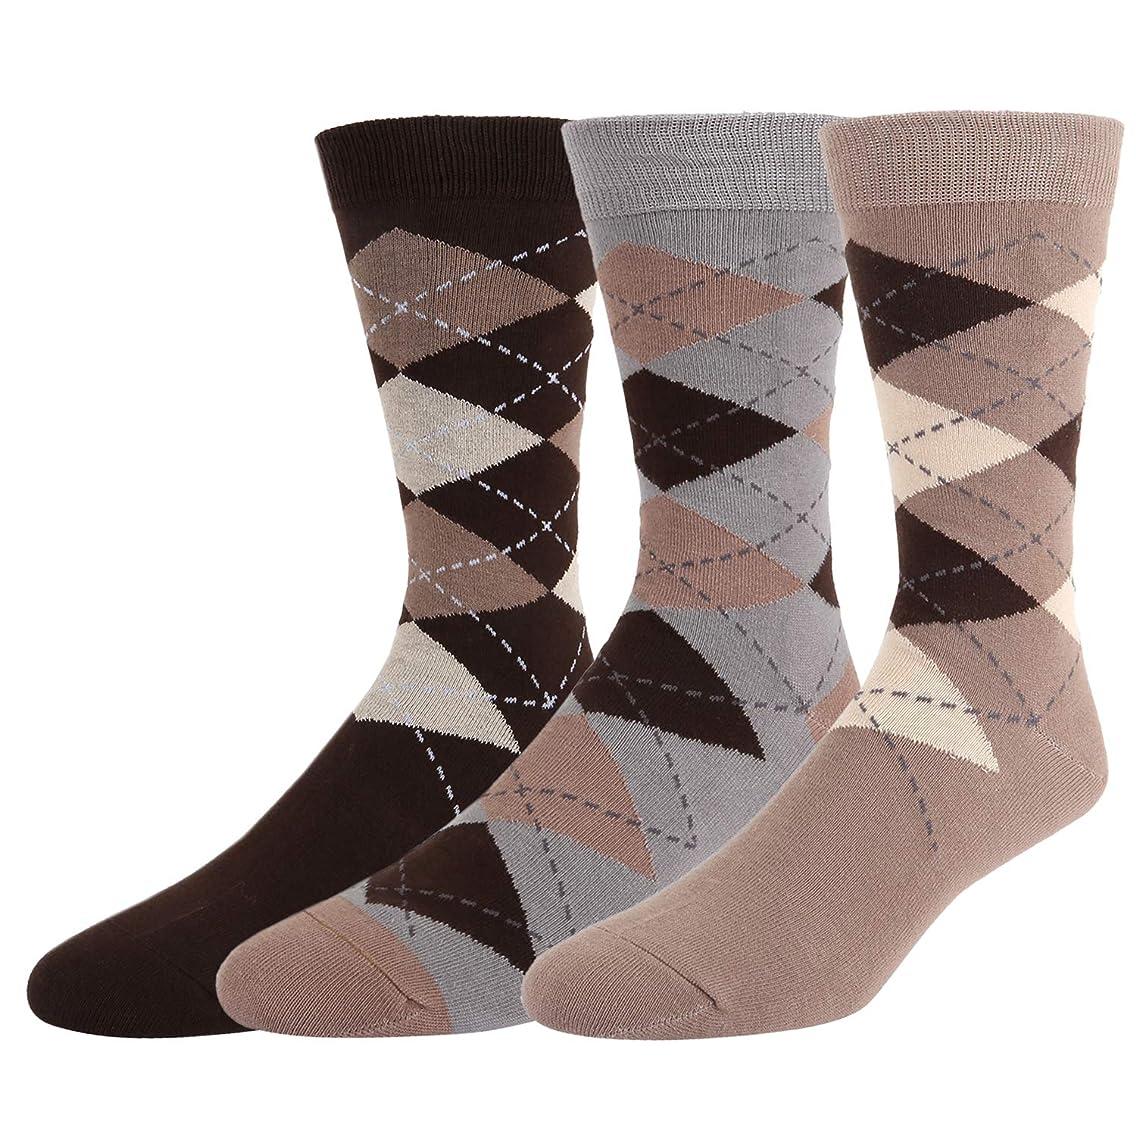 Zmart Men's Argyle Colorful Dress Trouser Socks Funny Crazy Art Patterned Cotton Crew Socks